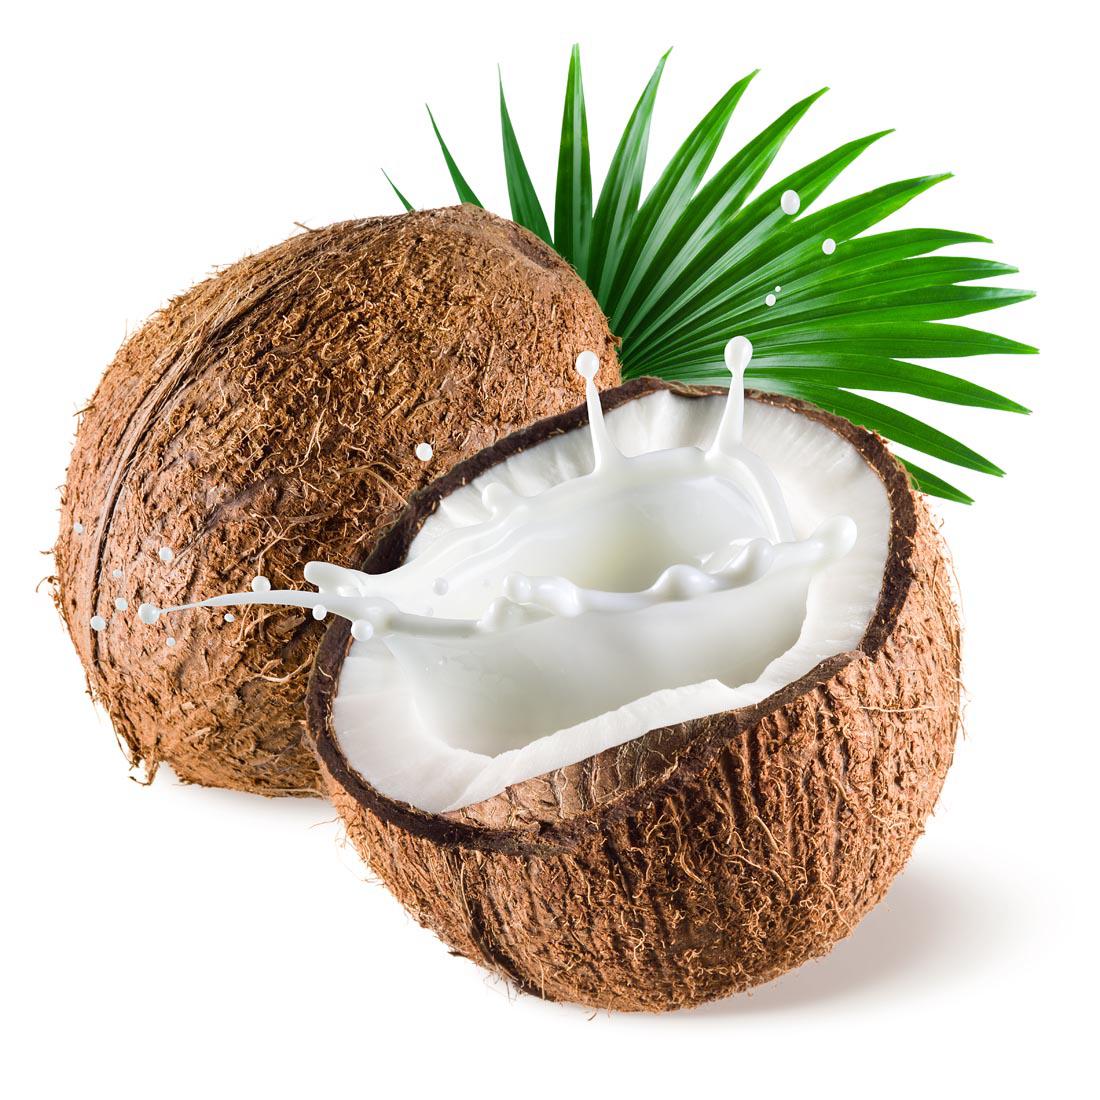 Coconut clipart fresh. Milk powder water transprent